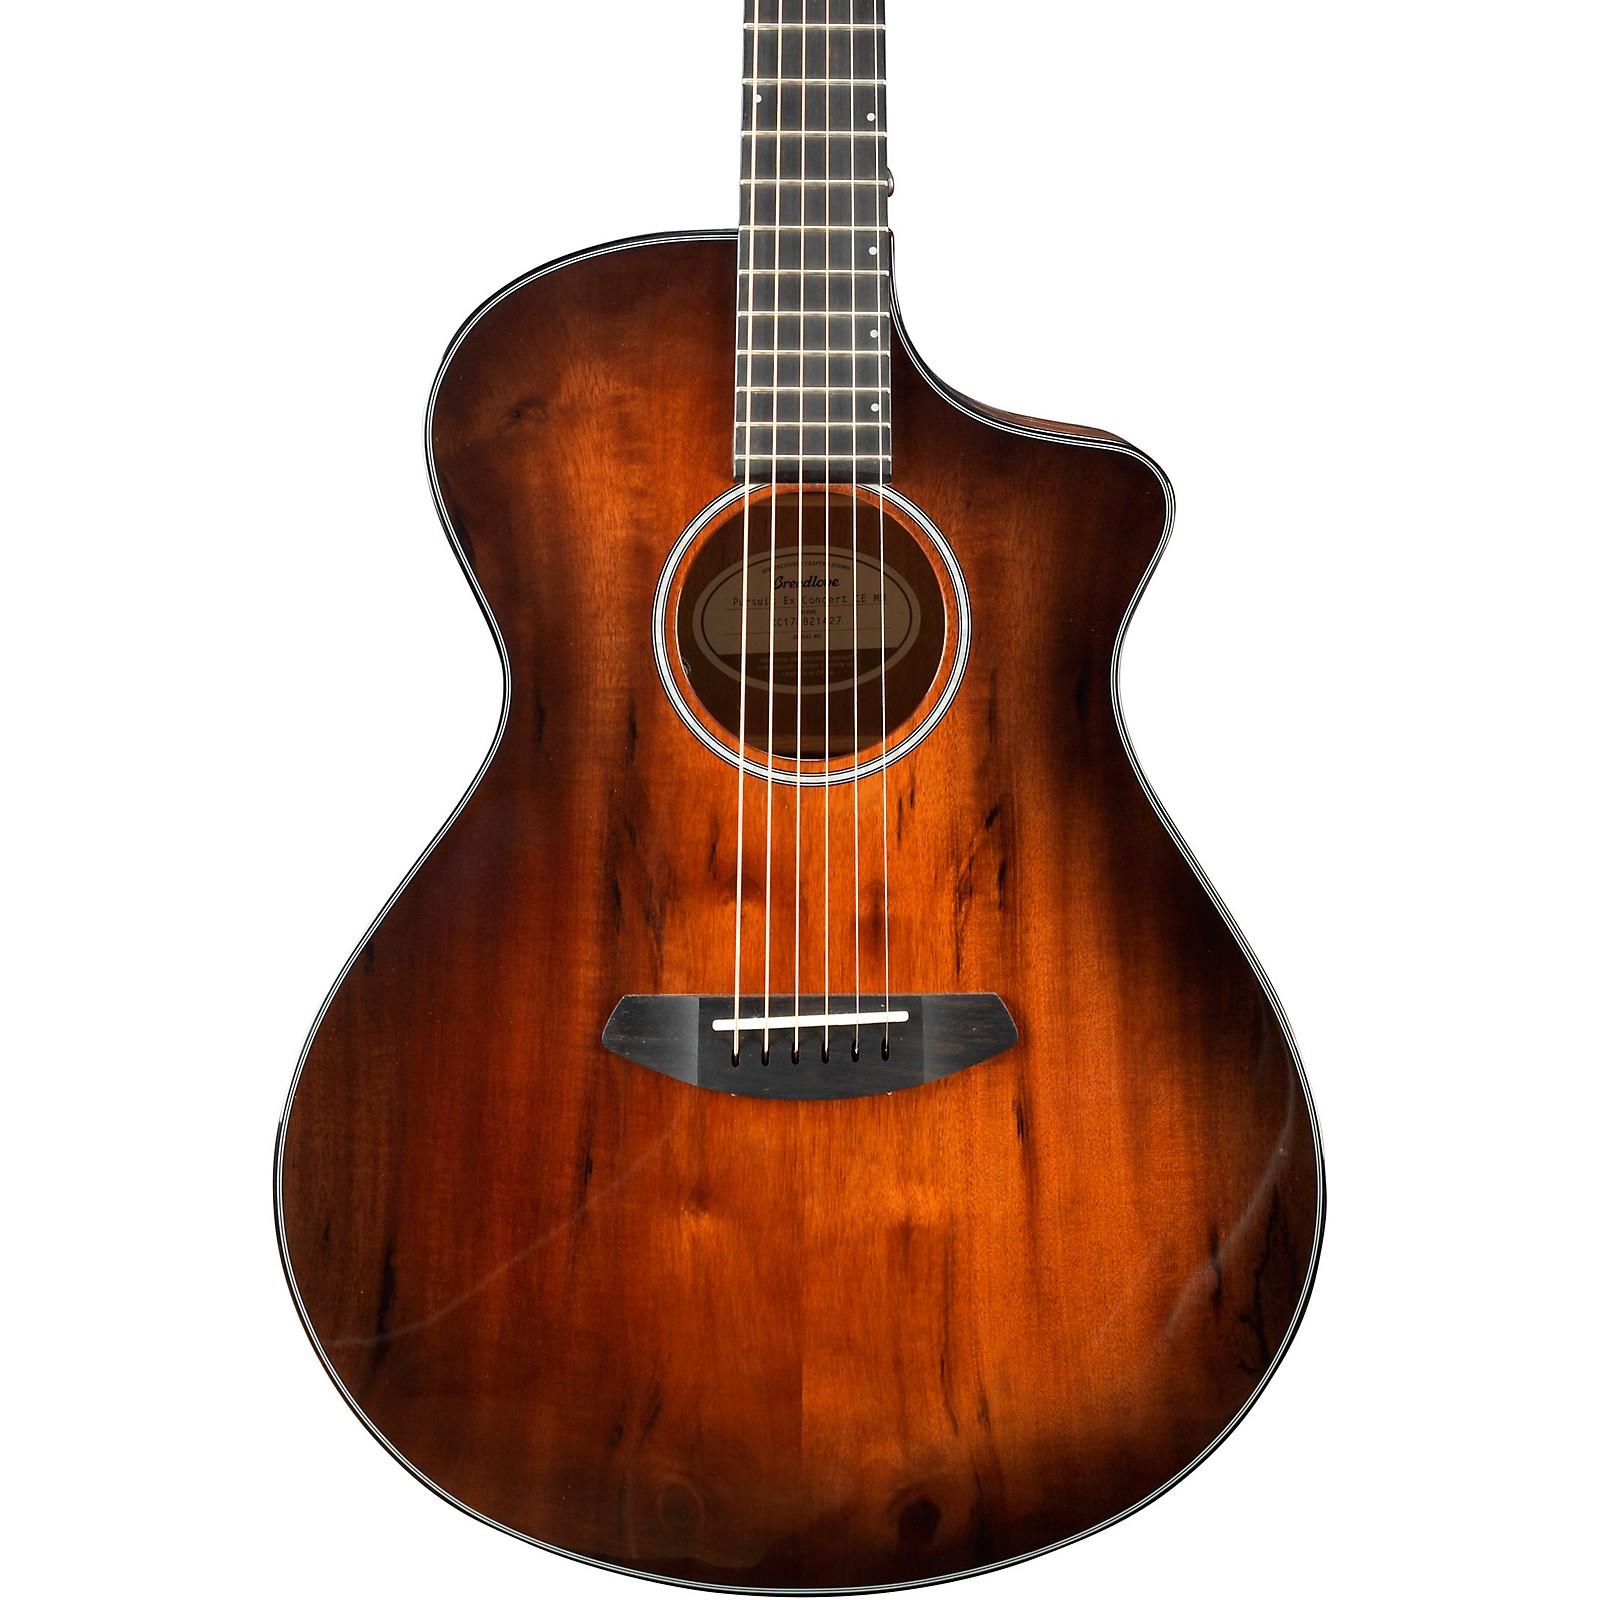 Breedlove Pursuit Exotic Concert Cutaway CE Myrtlewood Acoustic-Electric Guitar